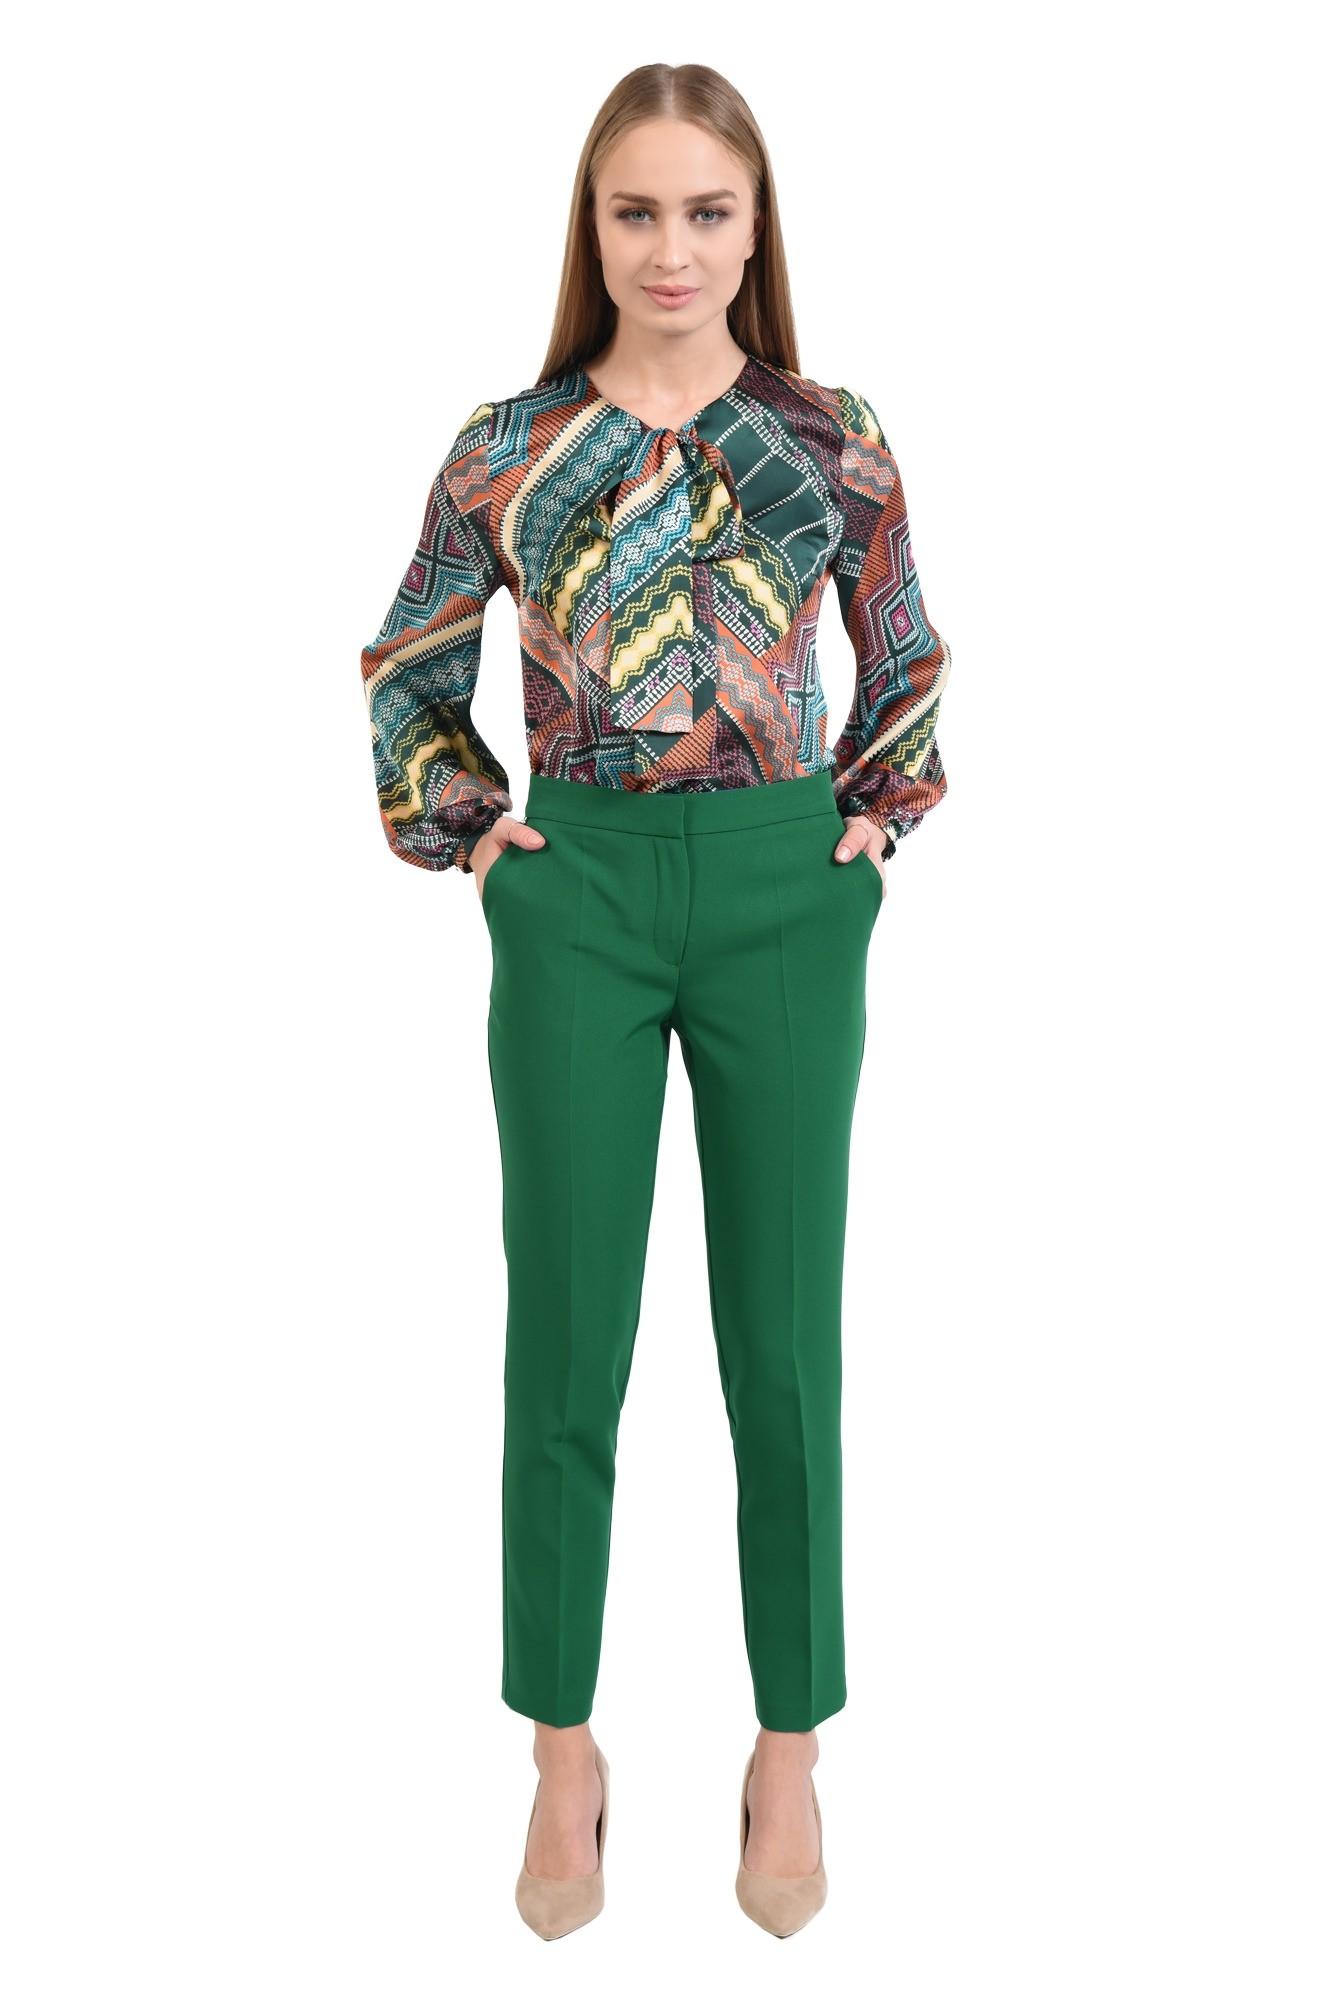 3 - 360 - pantaloni casual, croi conic, betelie, la dunga